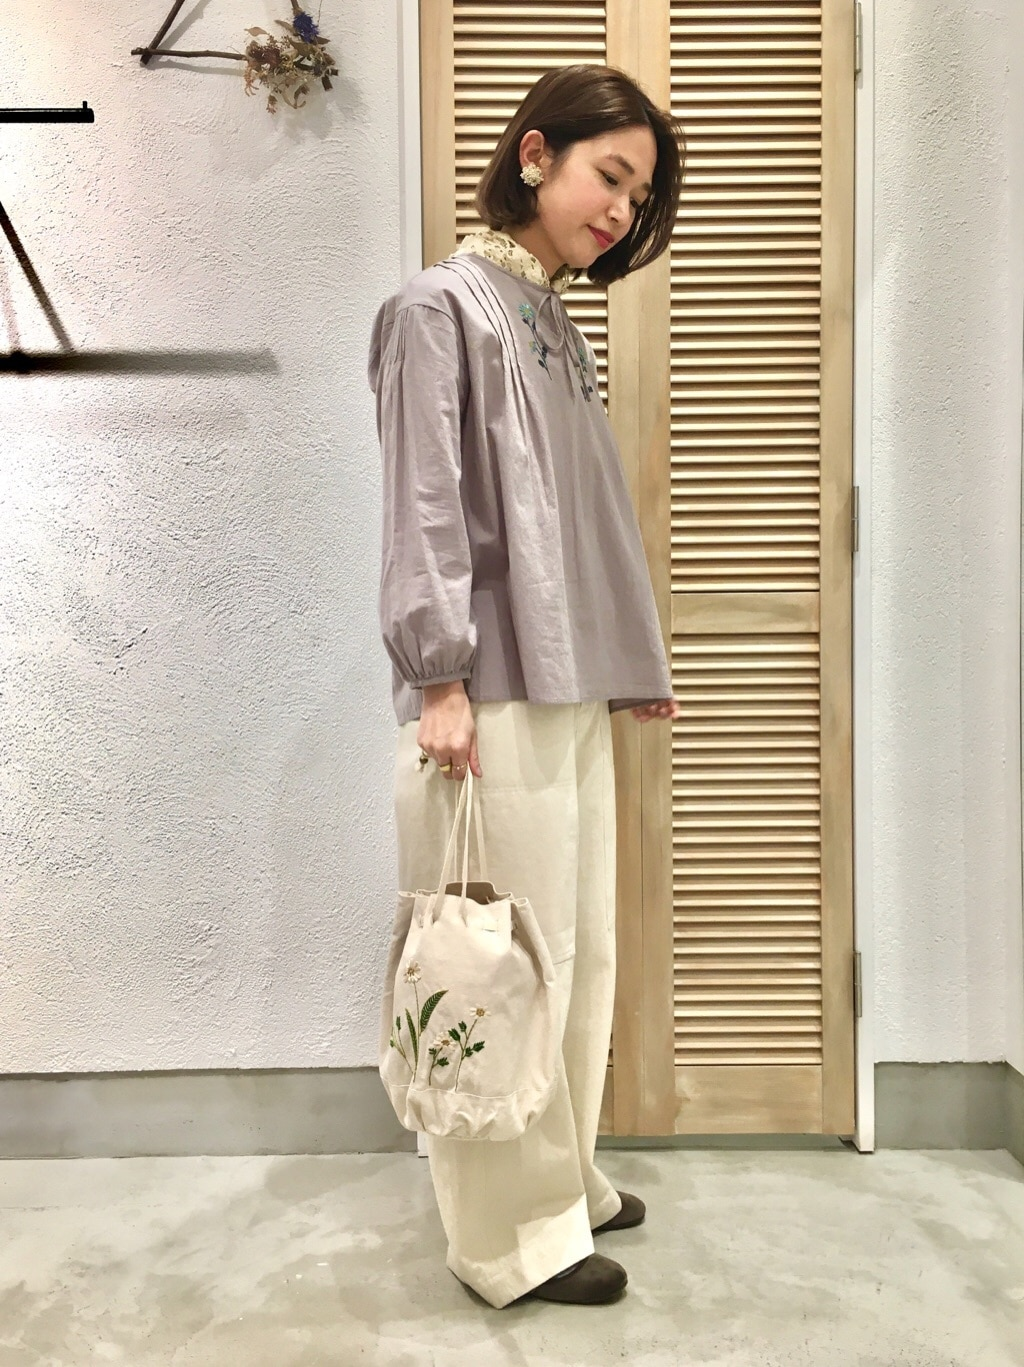 chambre de charme 横浜ジョイナス 身長:160cm 2021.02.09